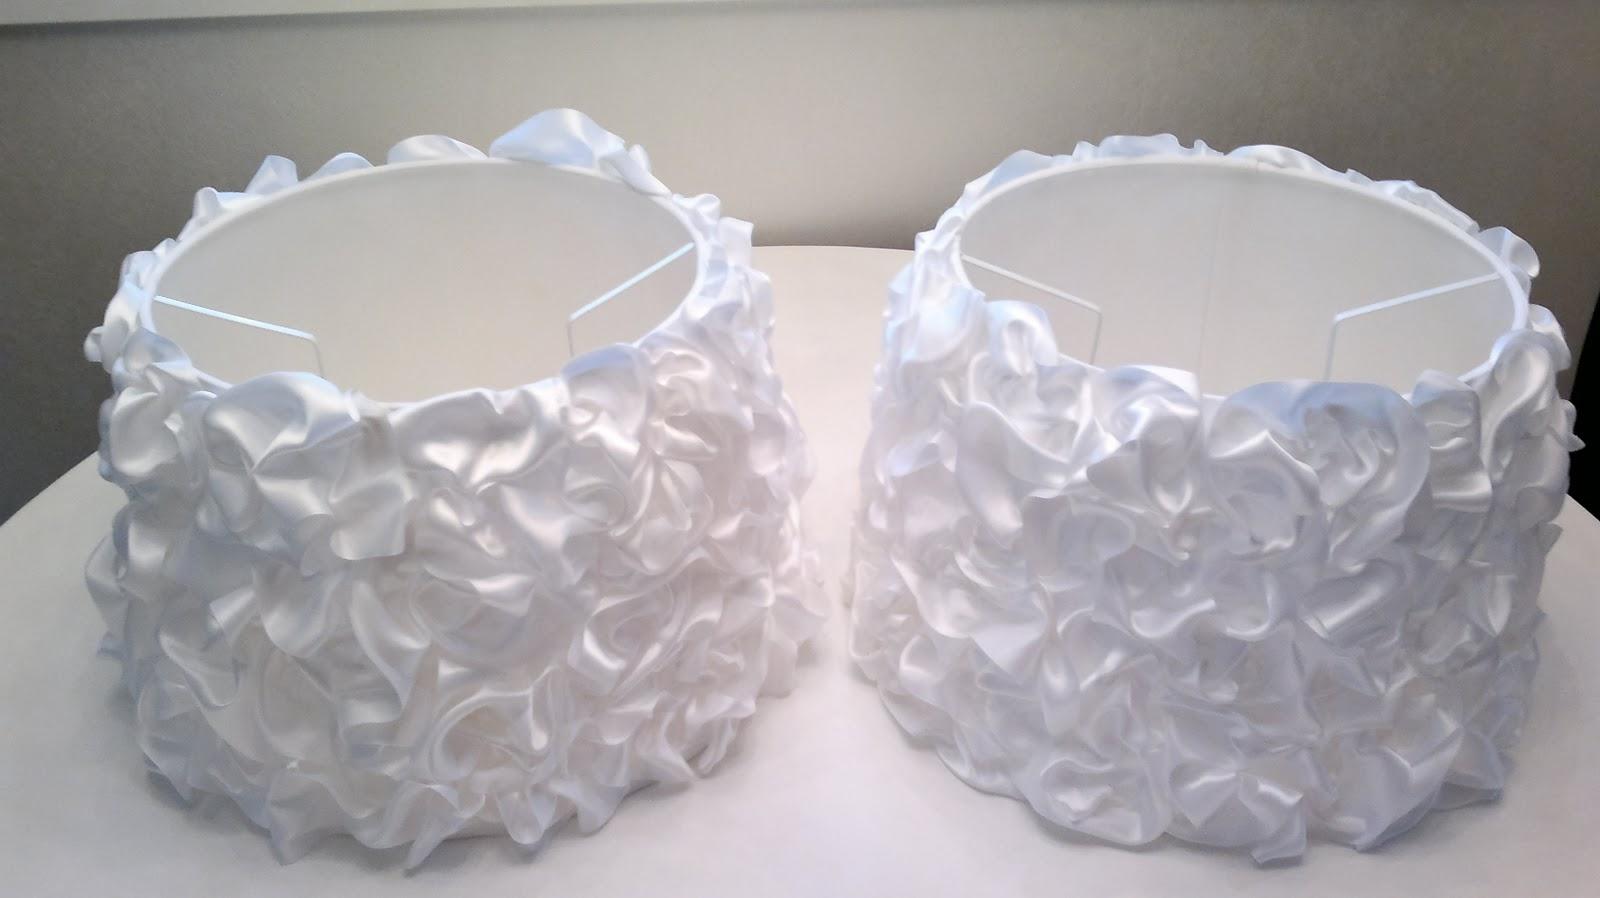 Custom Made Lamp Shade: Fasts & Easy Custom Made Lampshades With Ribbon Ruffles,Lighting